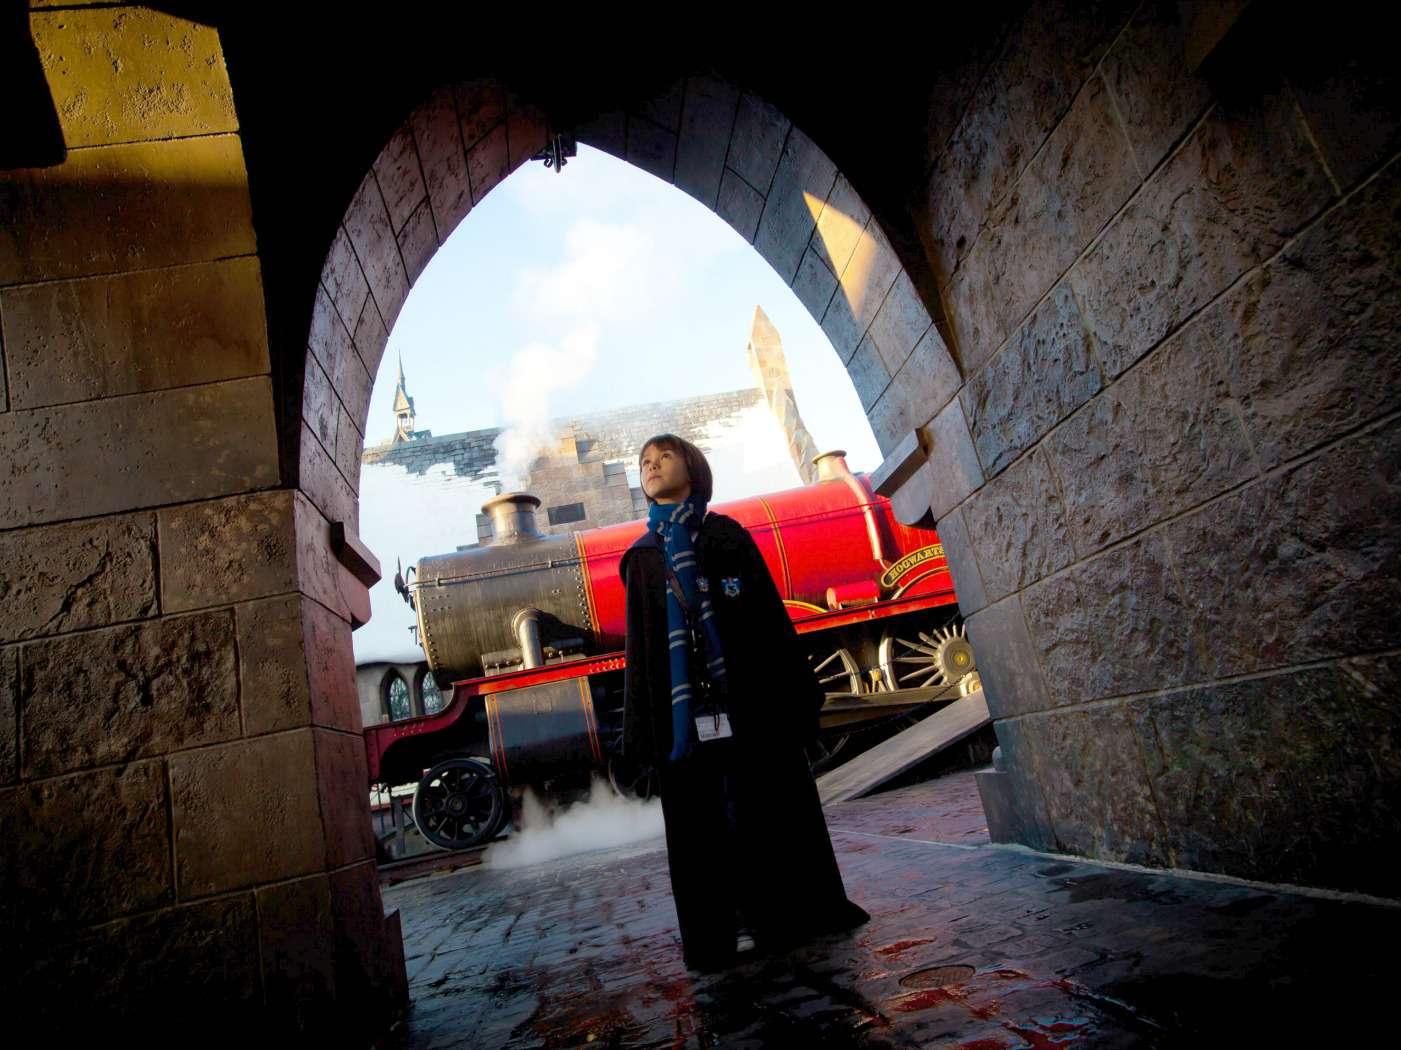 Hogswart Express at Hogsmeade